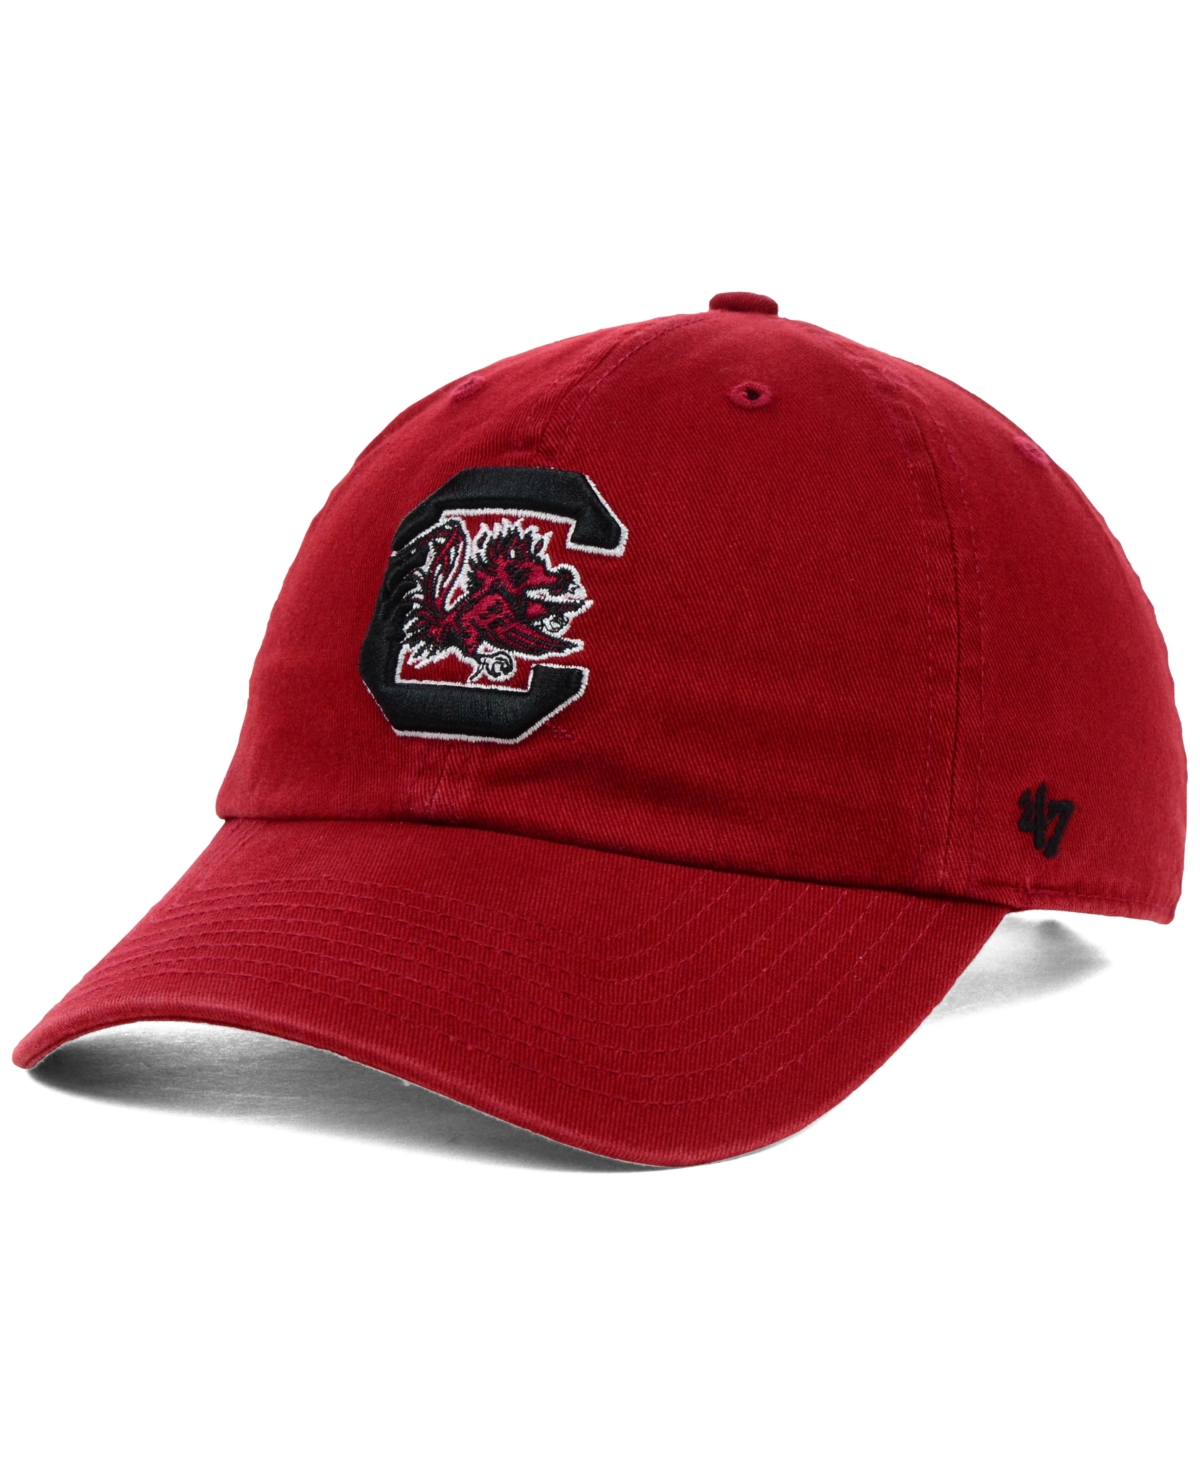 47 Brand South Carolina Gamecocks Ncaa Clean-Up Cap